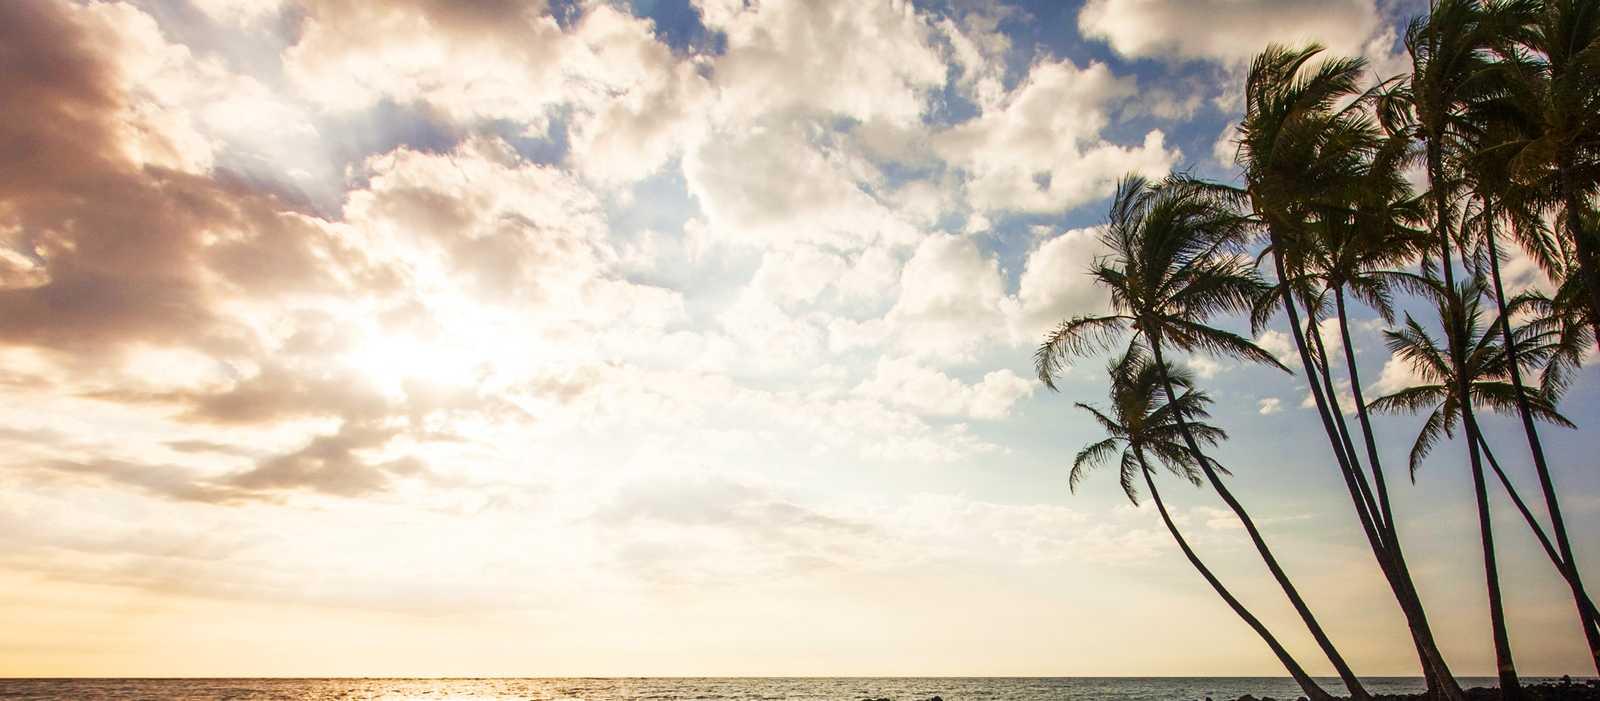 Sonnenuntergang in Kona am Mahaiula Beach, Big Island